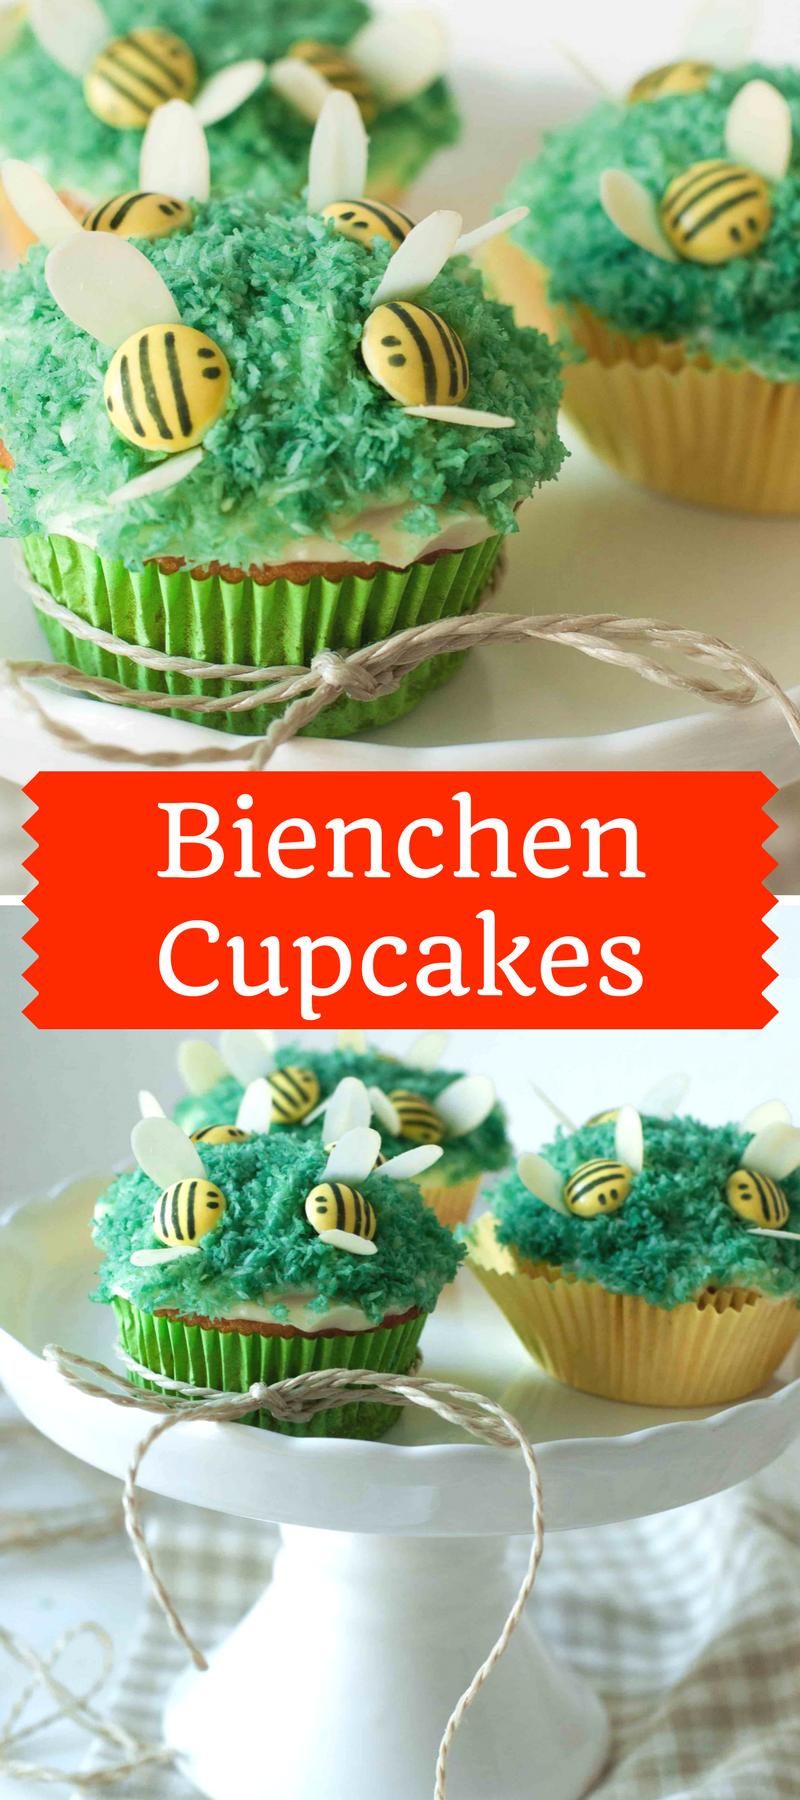 bienchen cupcakes mit smarties in 2018 madewithluba rezepte pinterest lustige cupcakes. Black Bedroom Furniture Sets. Home Design Ideas